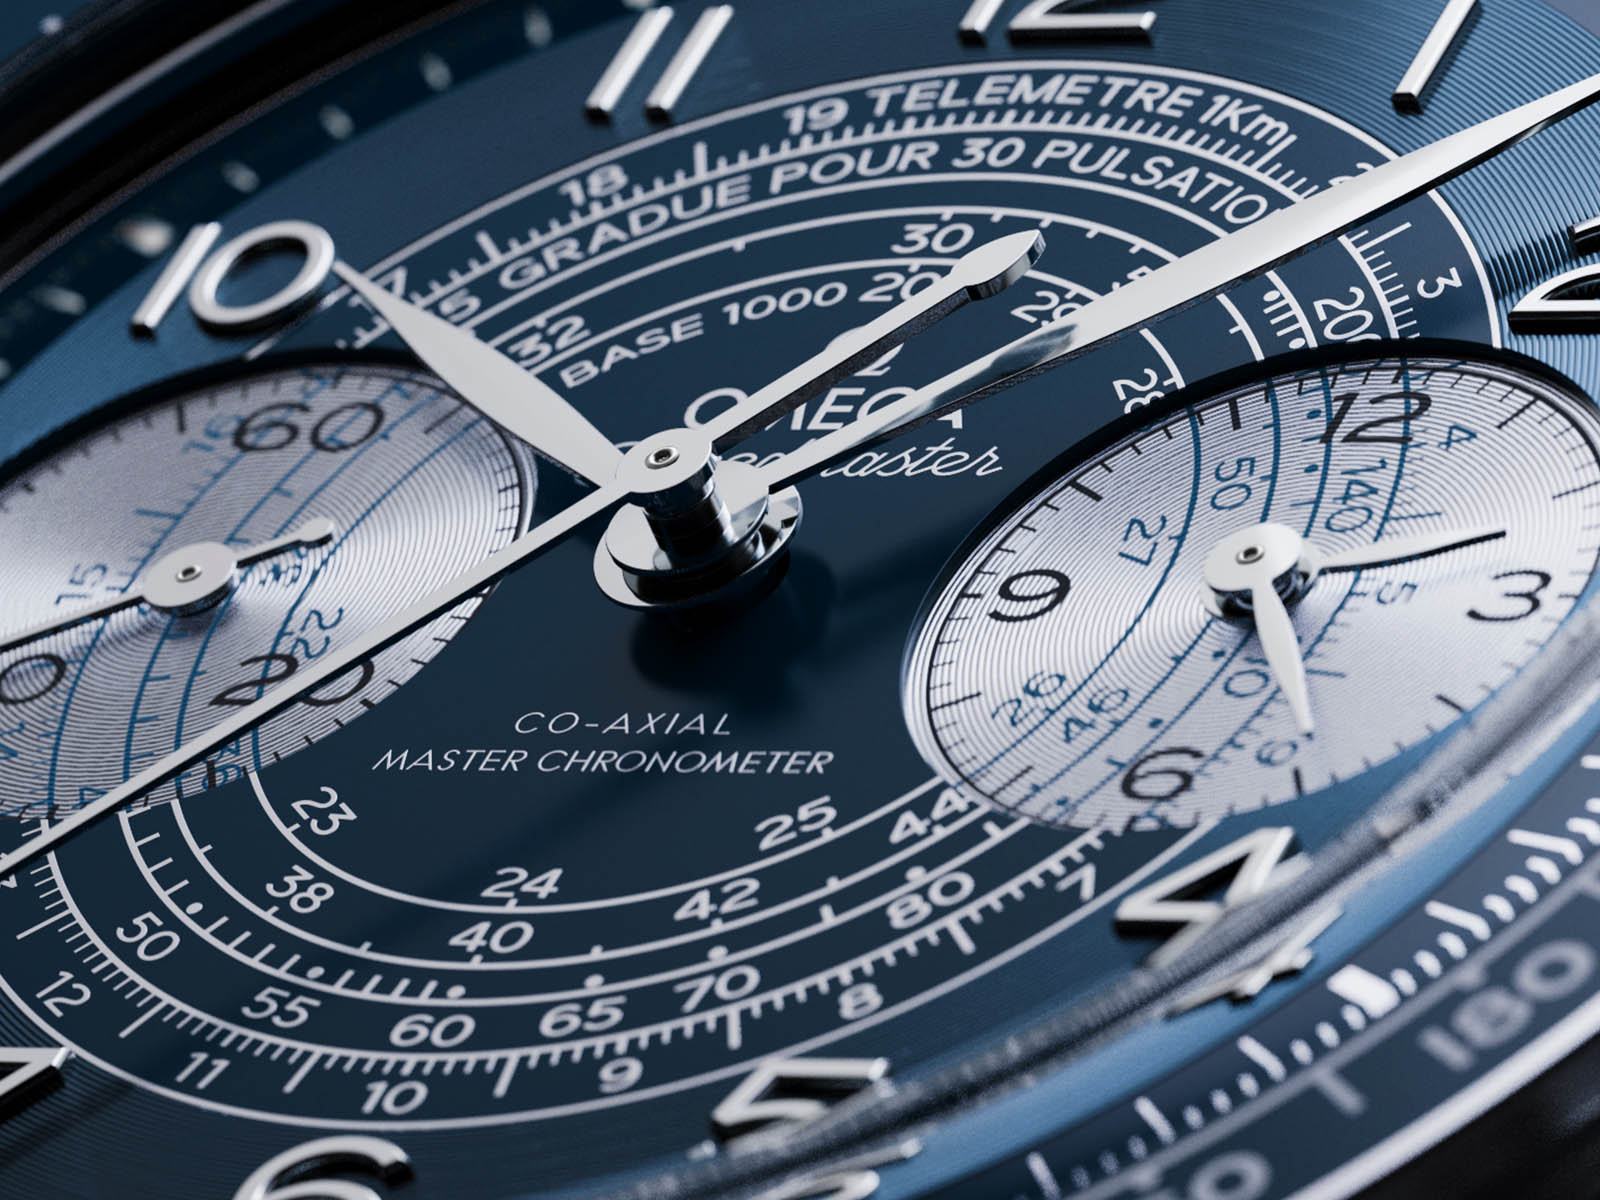 omega-speedmaster-chronoscope-co-axial-master-chronometer-chronograph-4.jpg